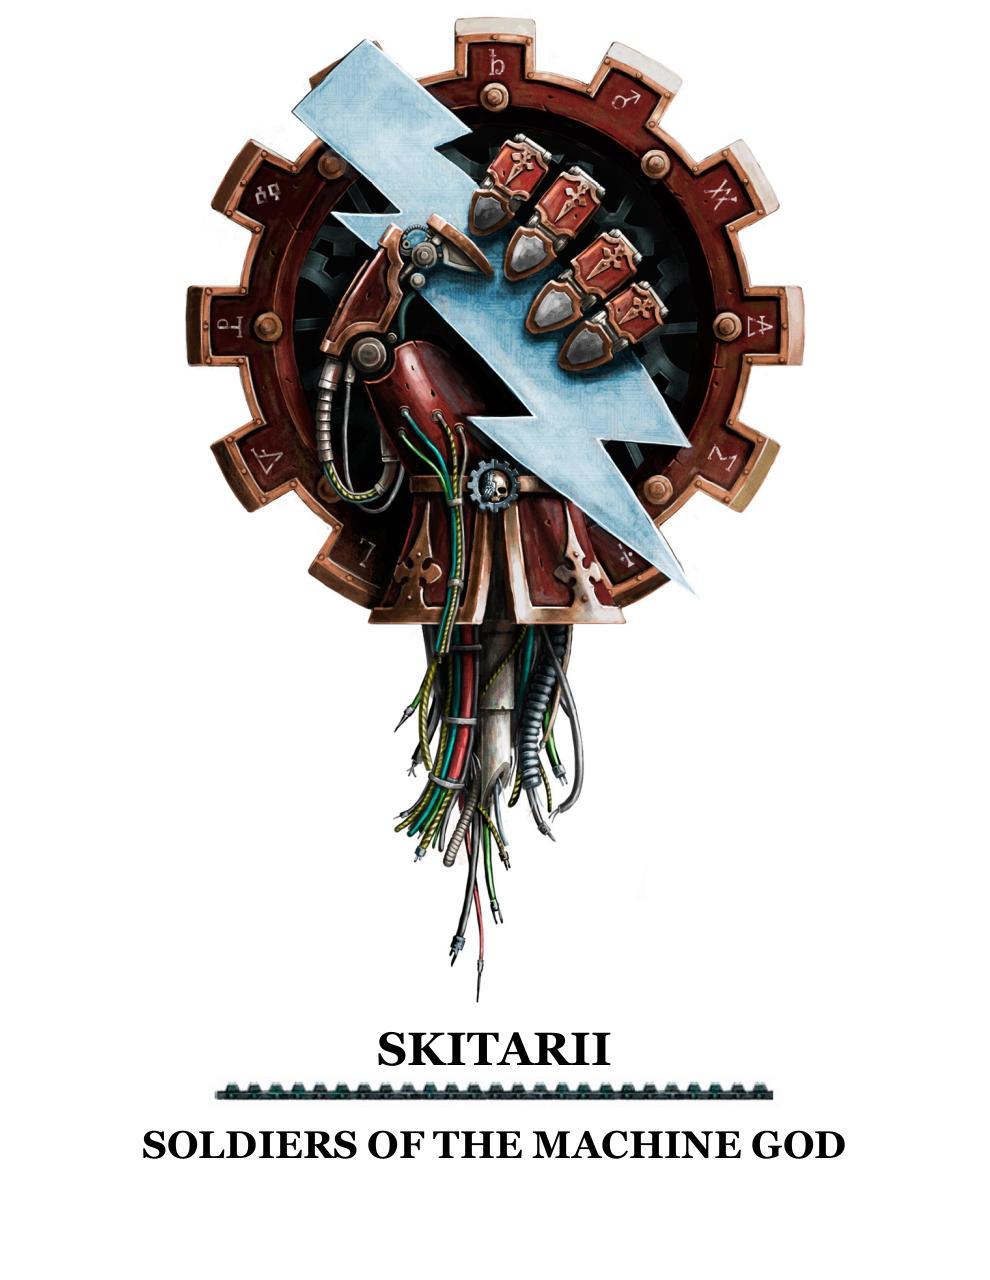 Codex Skitarii par Games Workshop Ltd - Wh40k - Skitarii